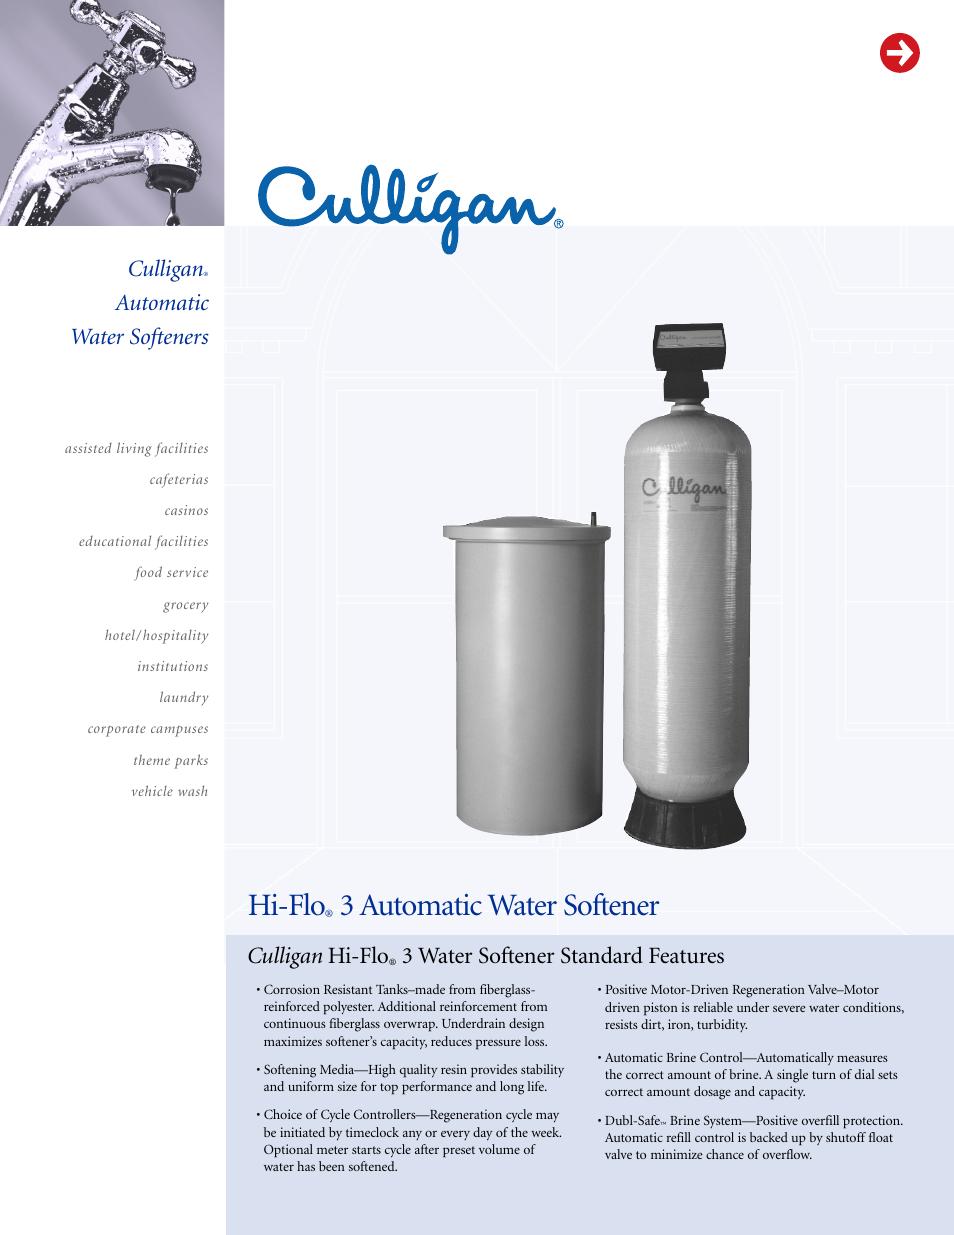 culligan automatic water softeners user manual 9 pages rh manualsdir com culligan hi flo 2 water conditioner manual Hi-Flo Oil Filter